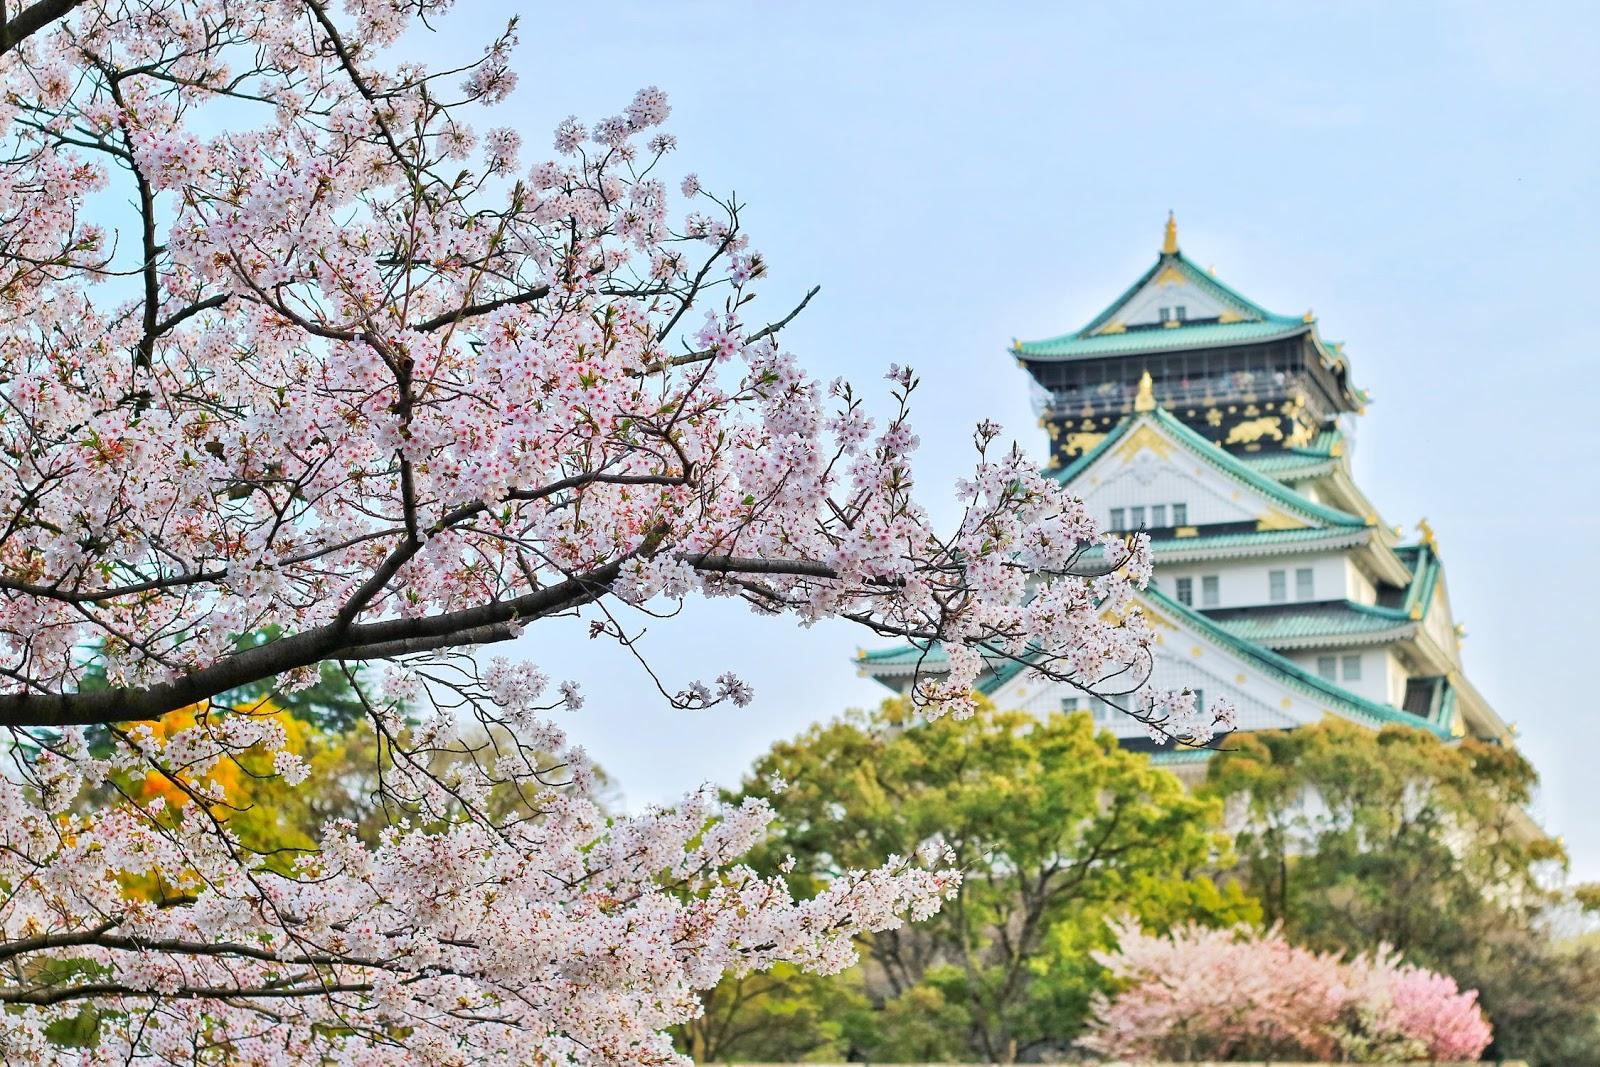 @entaconadas's cover photo for 'Cenas temáticas: Viajando a Japón - Entaconadas'